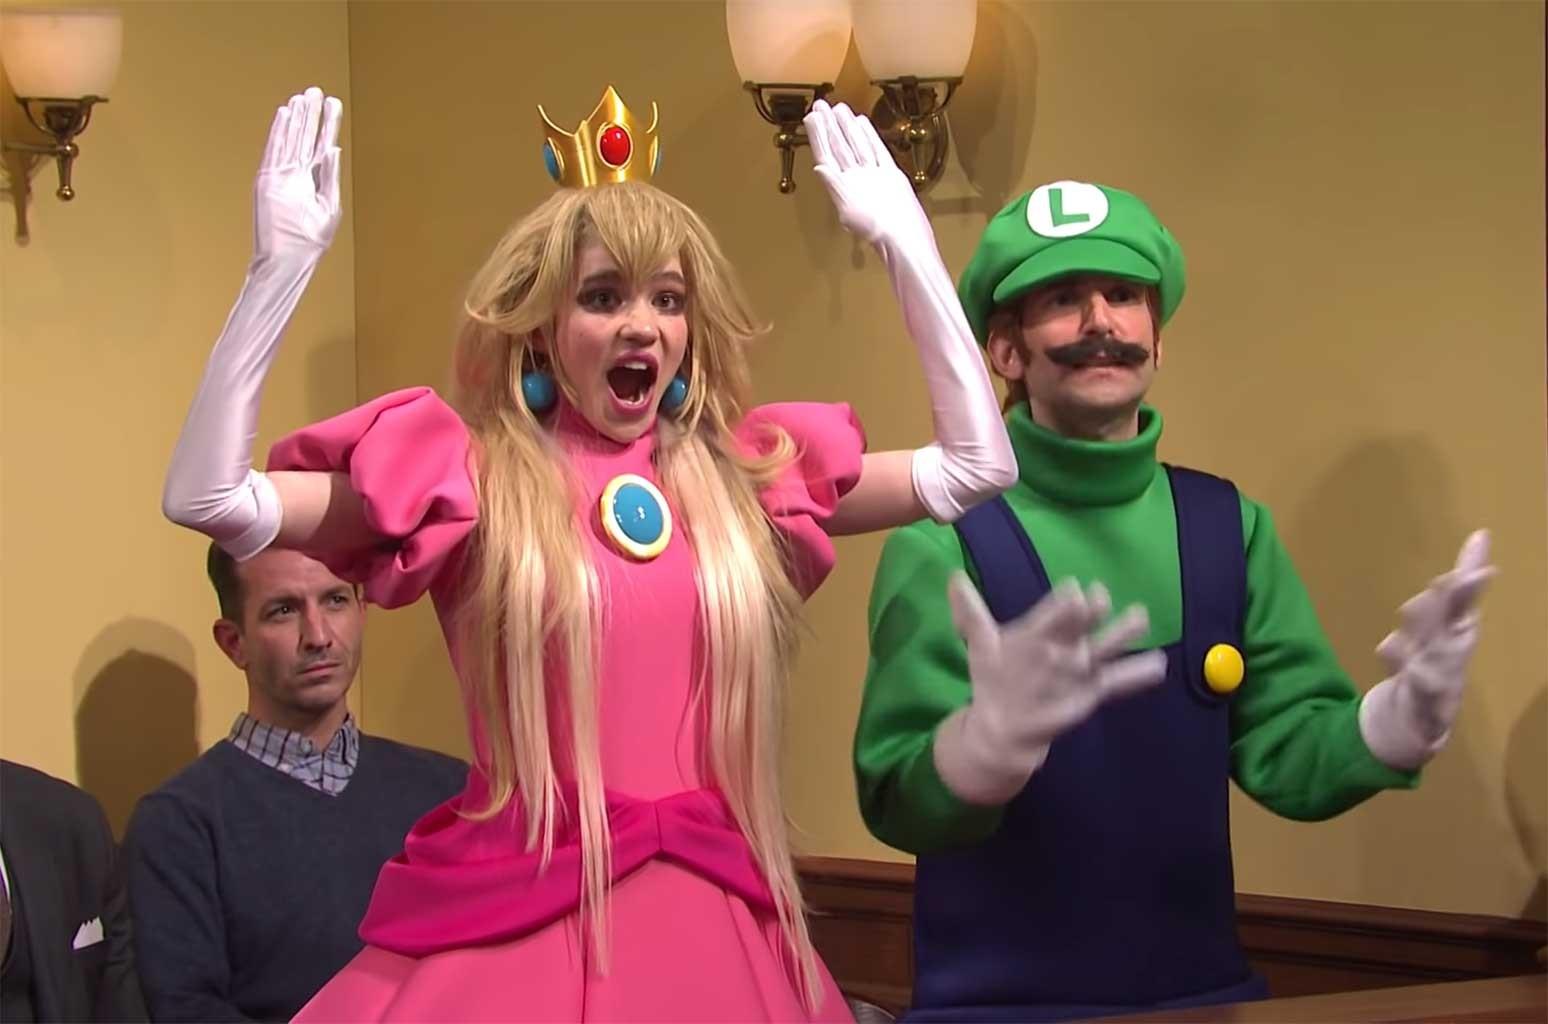 Grimes Nails it as Princess Peach Alongside Elon Musk as Wario in 'SNL' Super Mario Murder Trial Skit: Watch